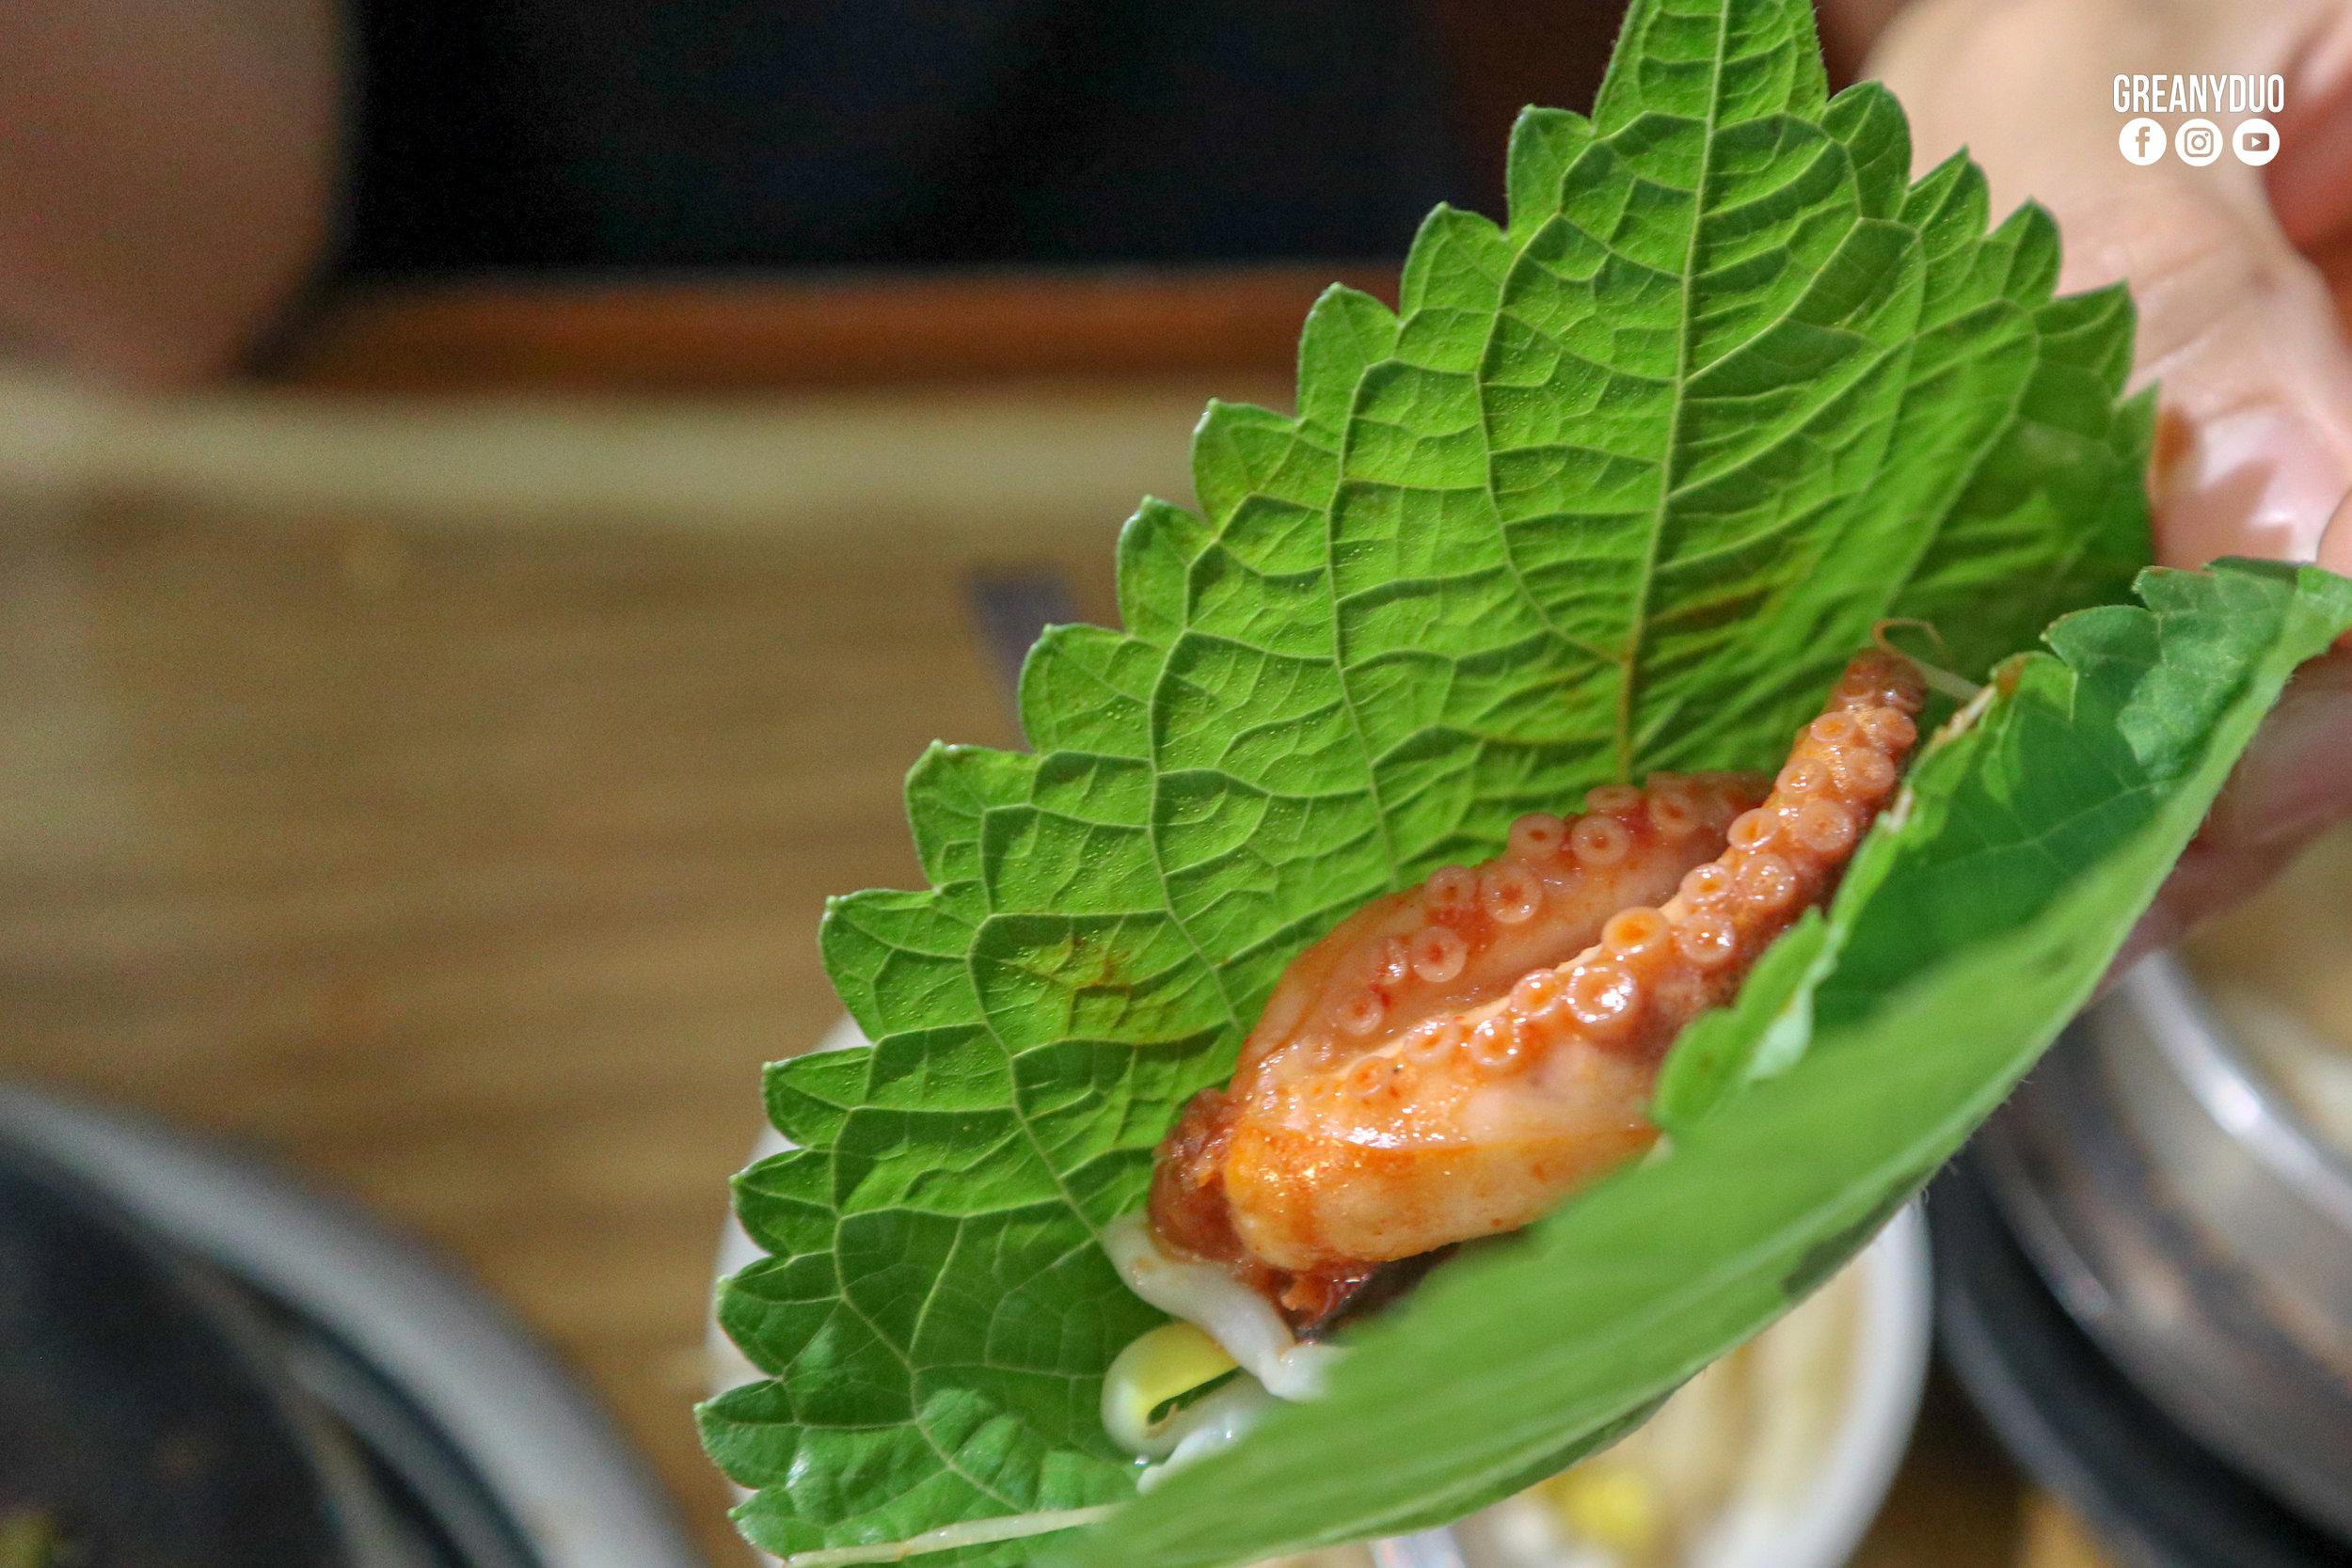 023Seoul_Food_WM.jpg